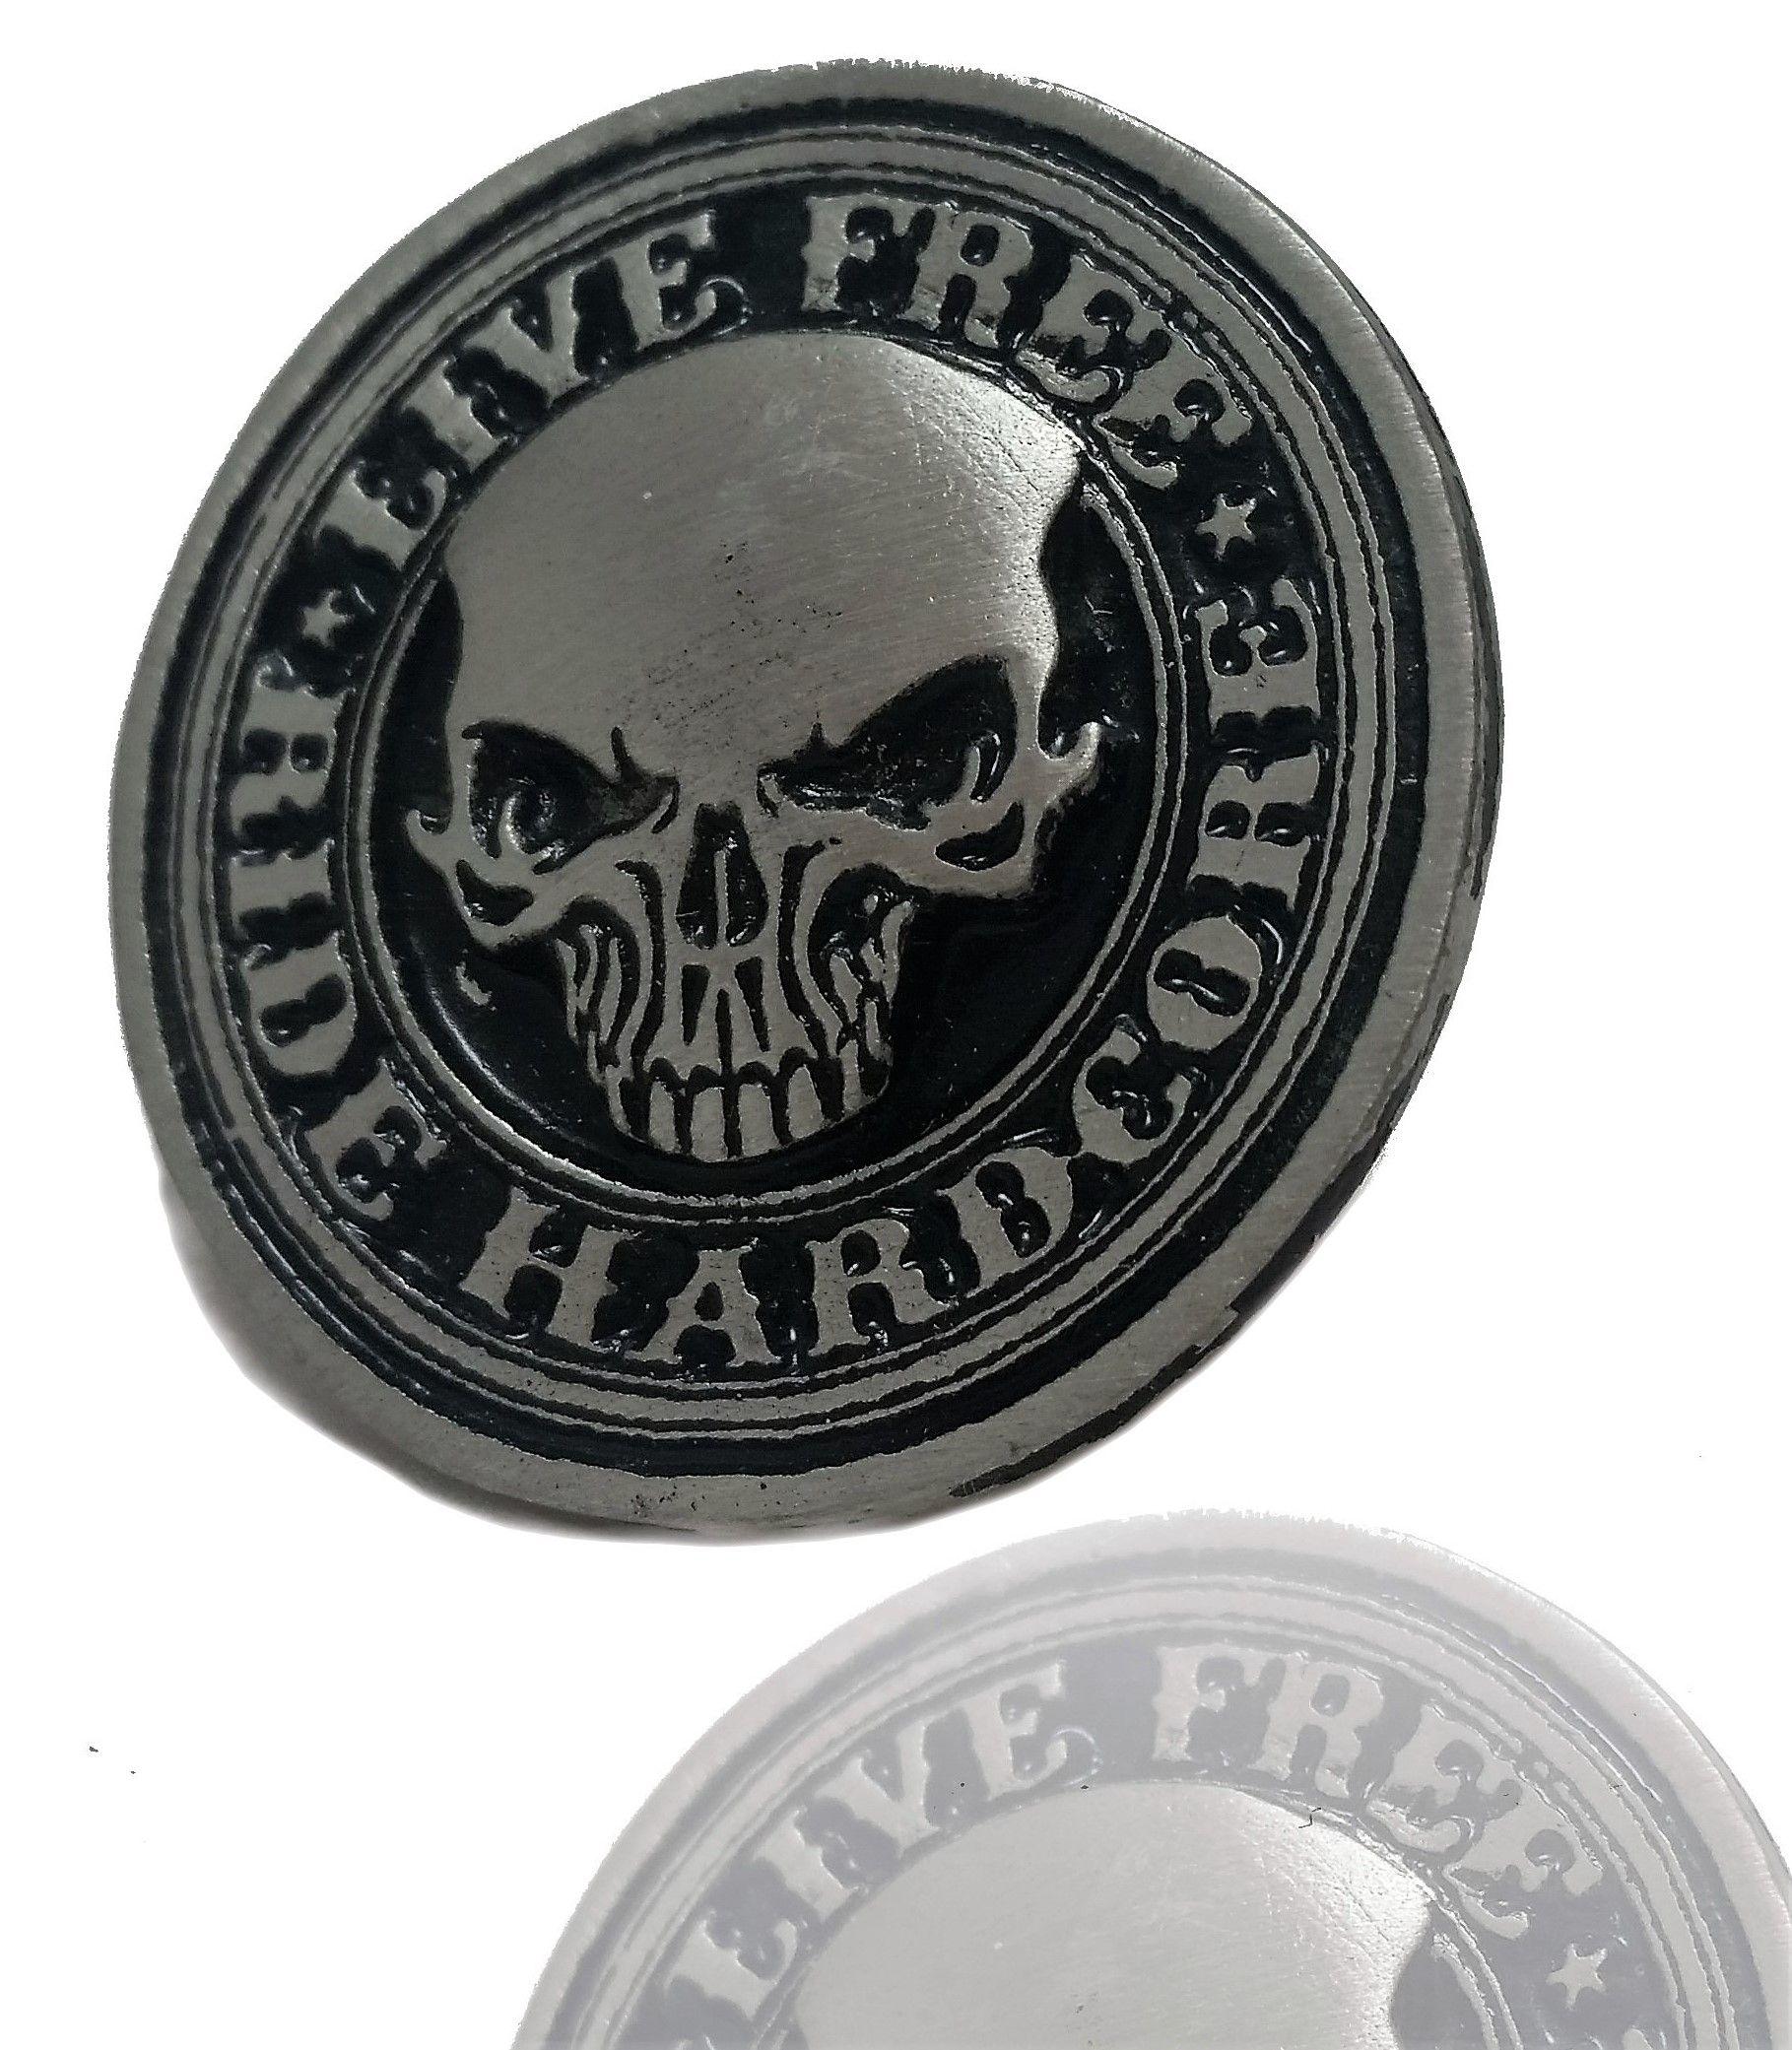 Daywalker Bikestuff Skull Pin Badge Biker Pin